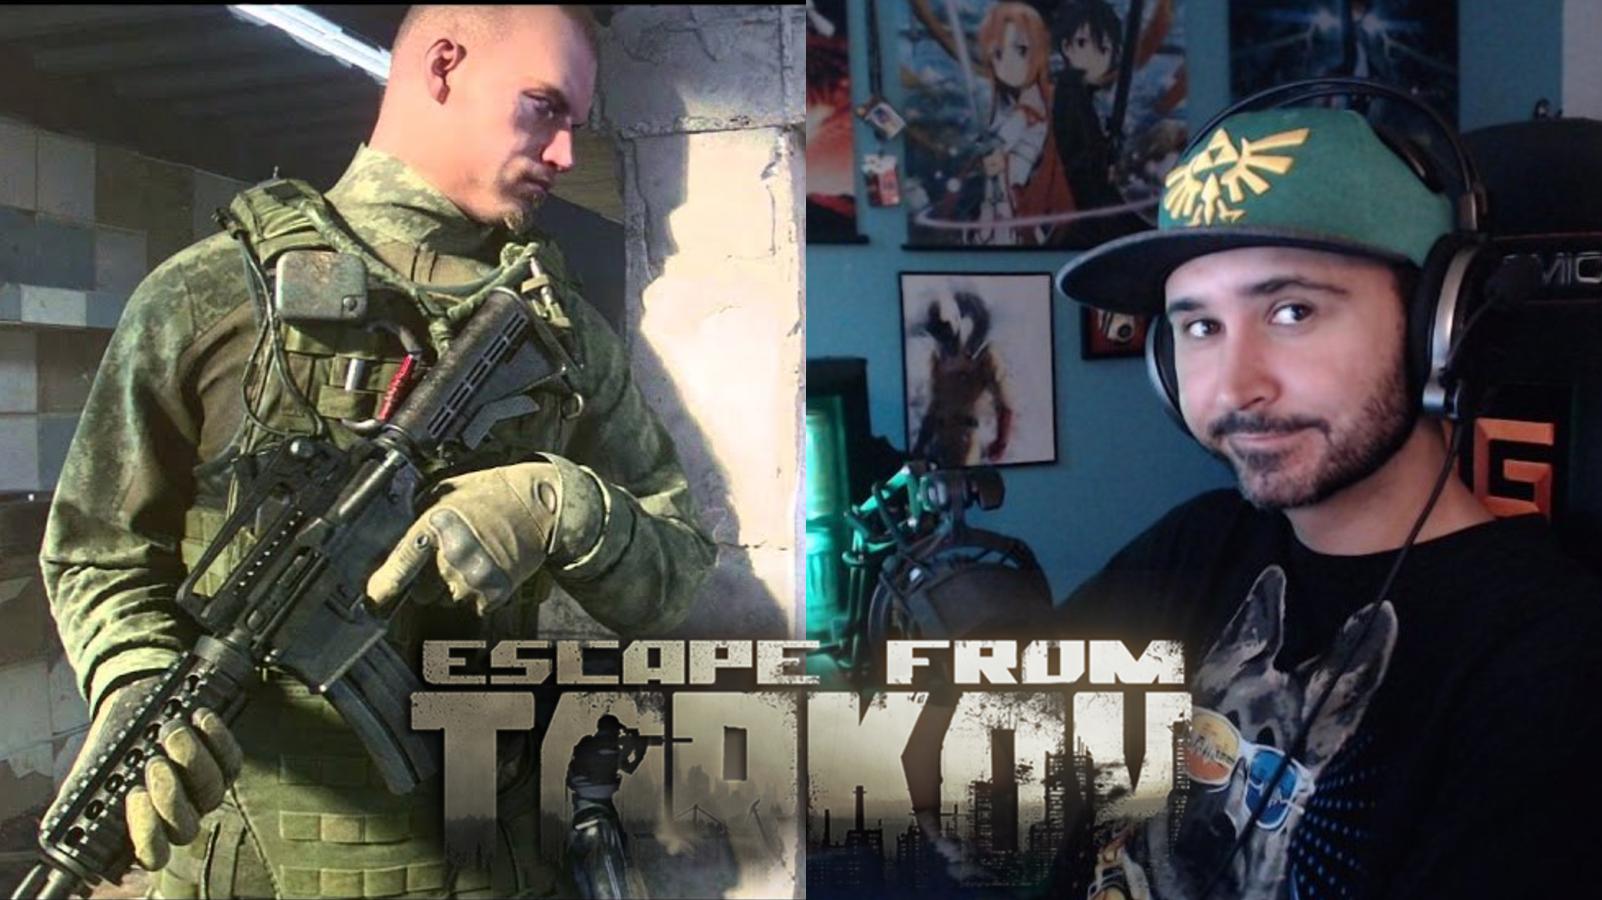 Summit1g Escape from Tarkov